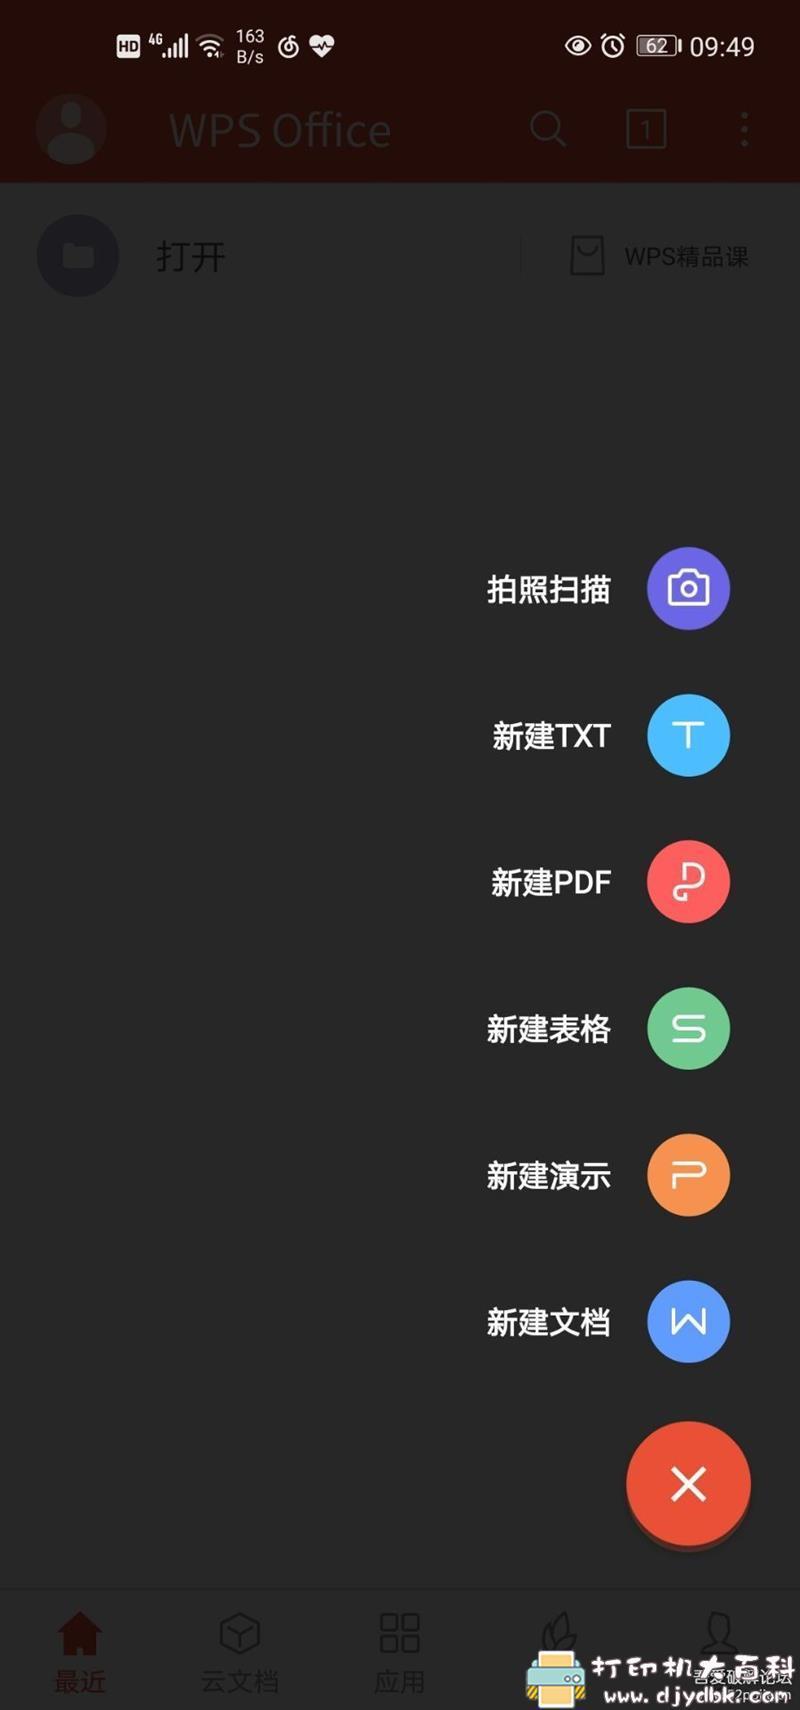 [Android]华为手机自带WPS提取版 简洁&启动超快图片 No.2